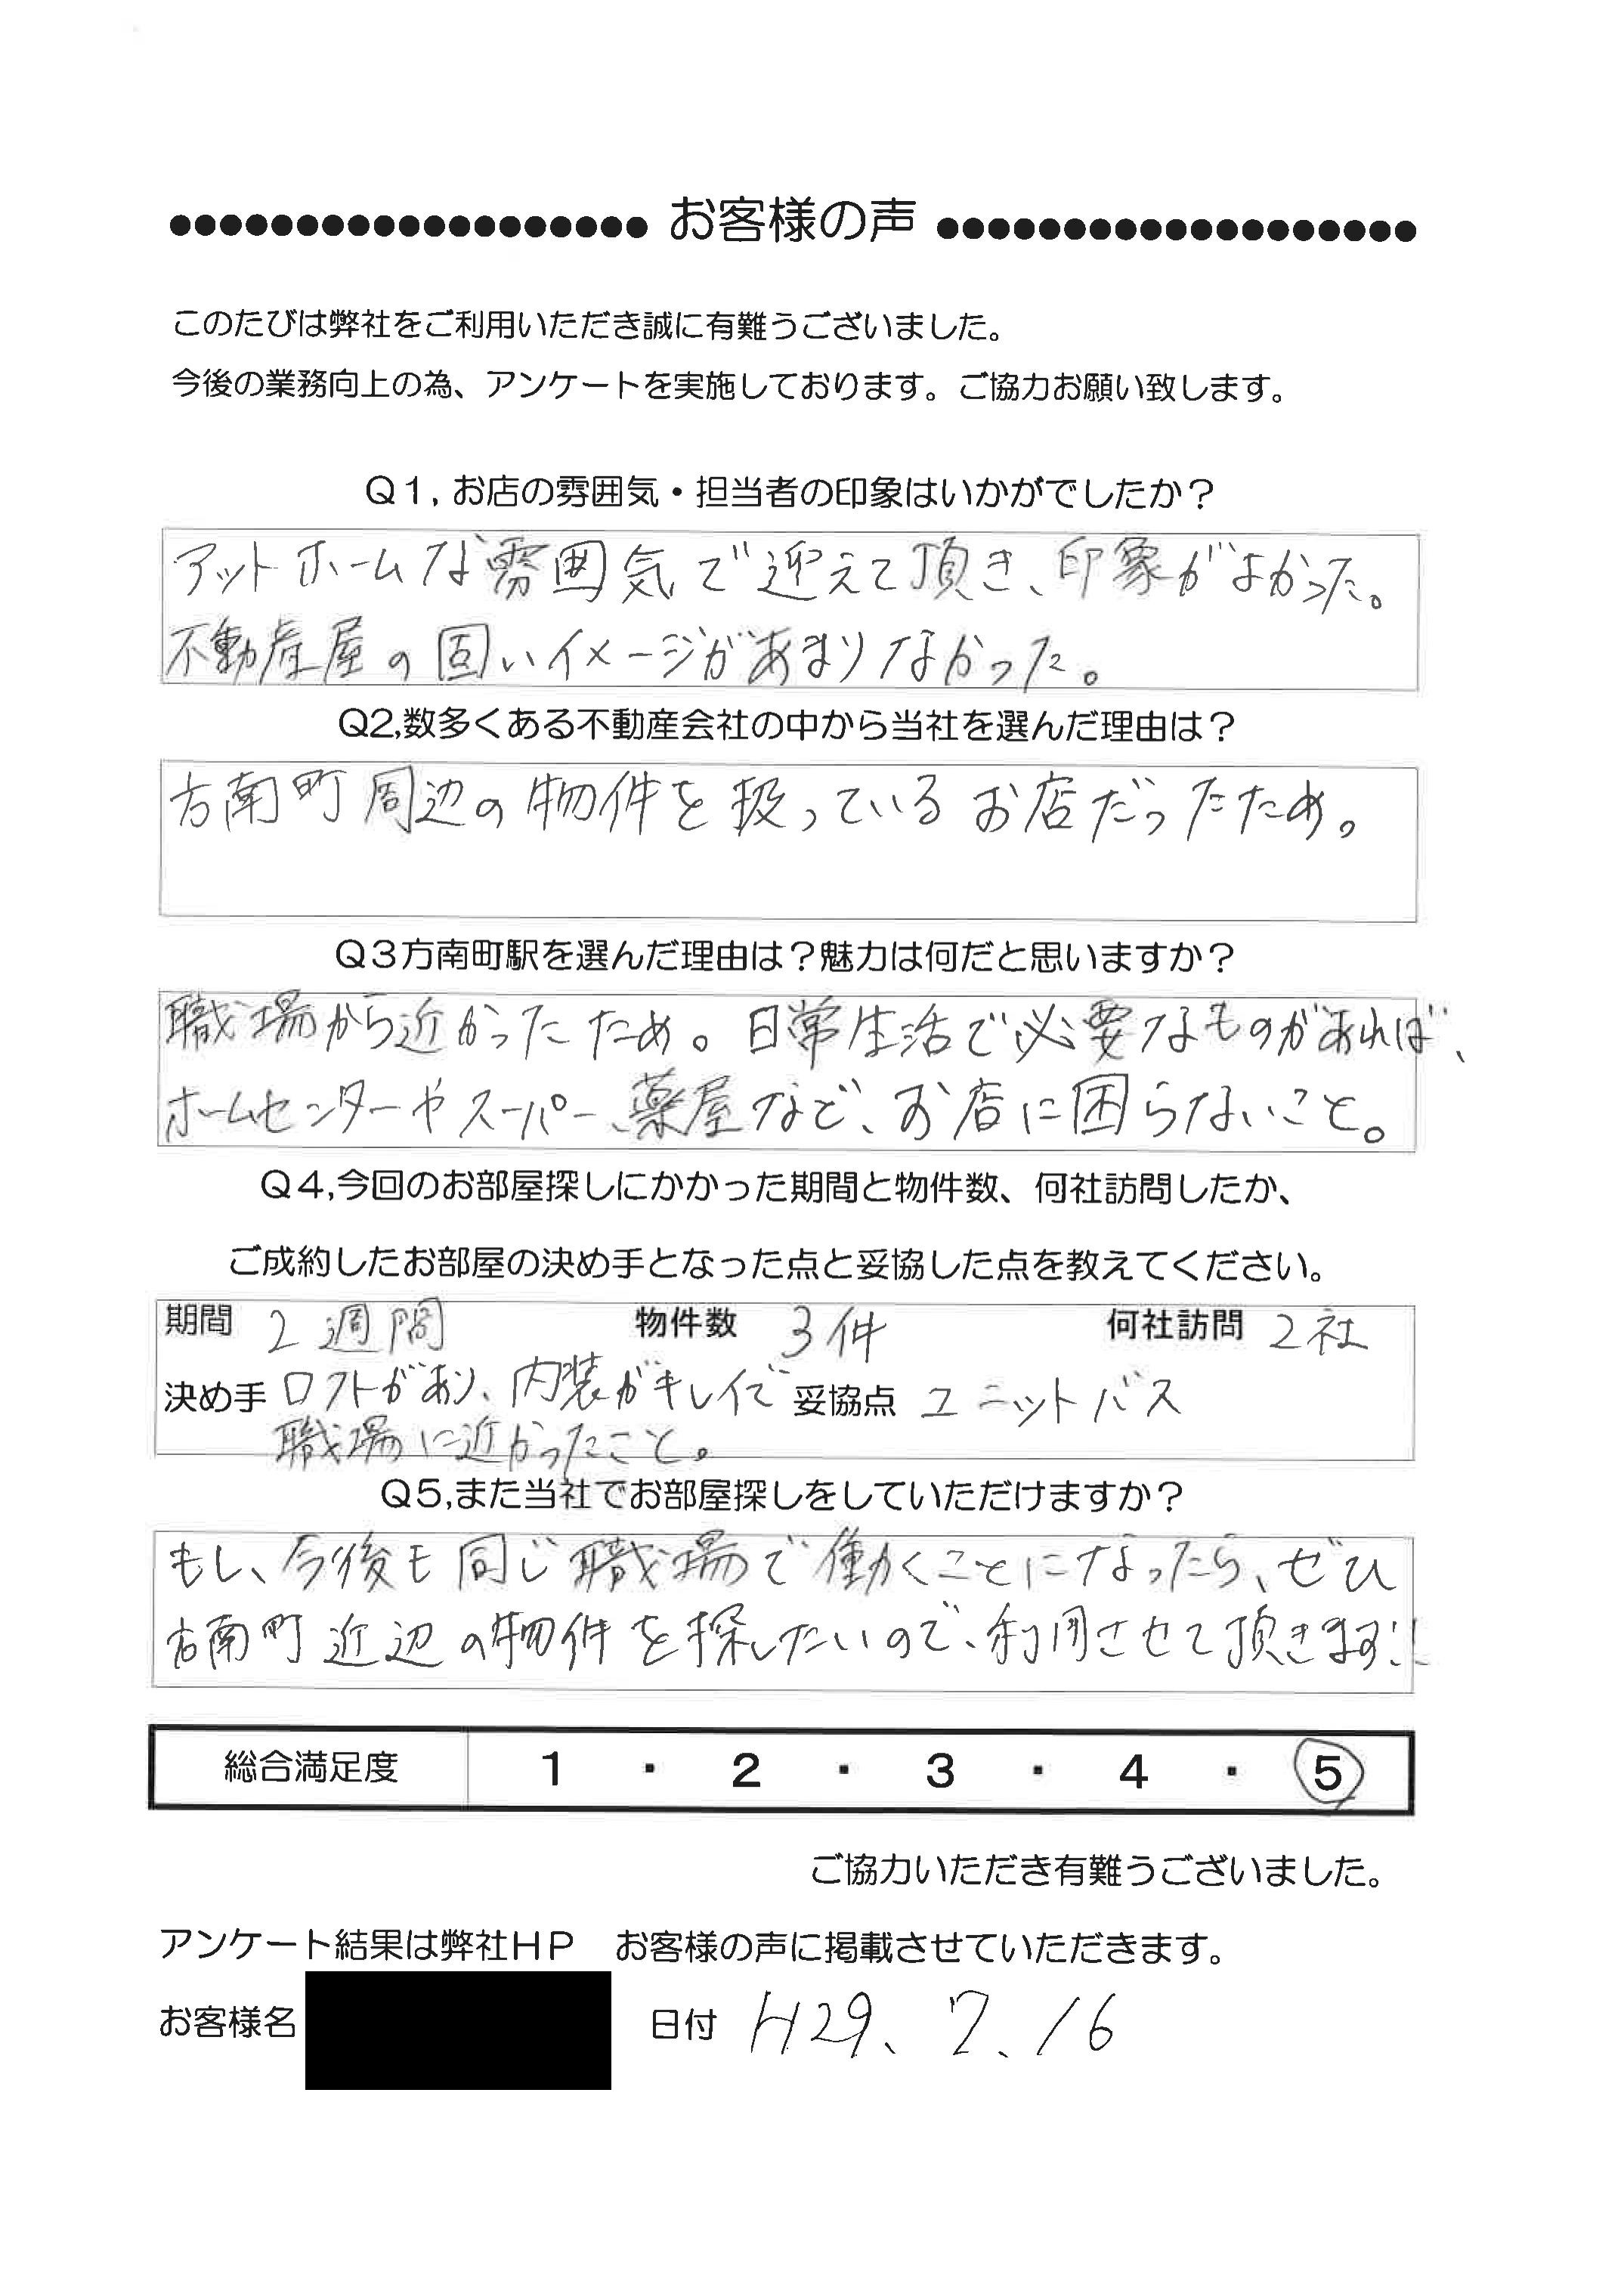 A・Y様 (24歳)女性(会社員)アンケート回答